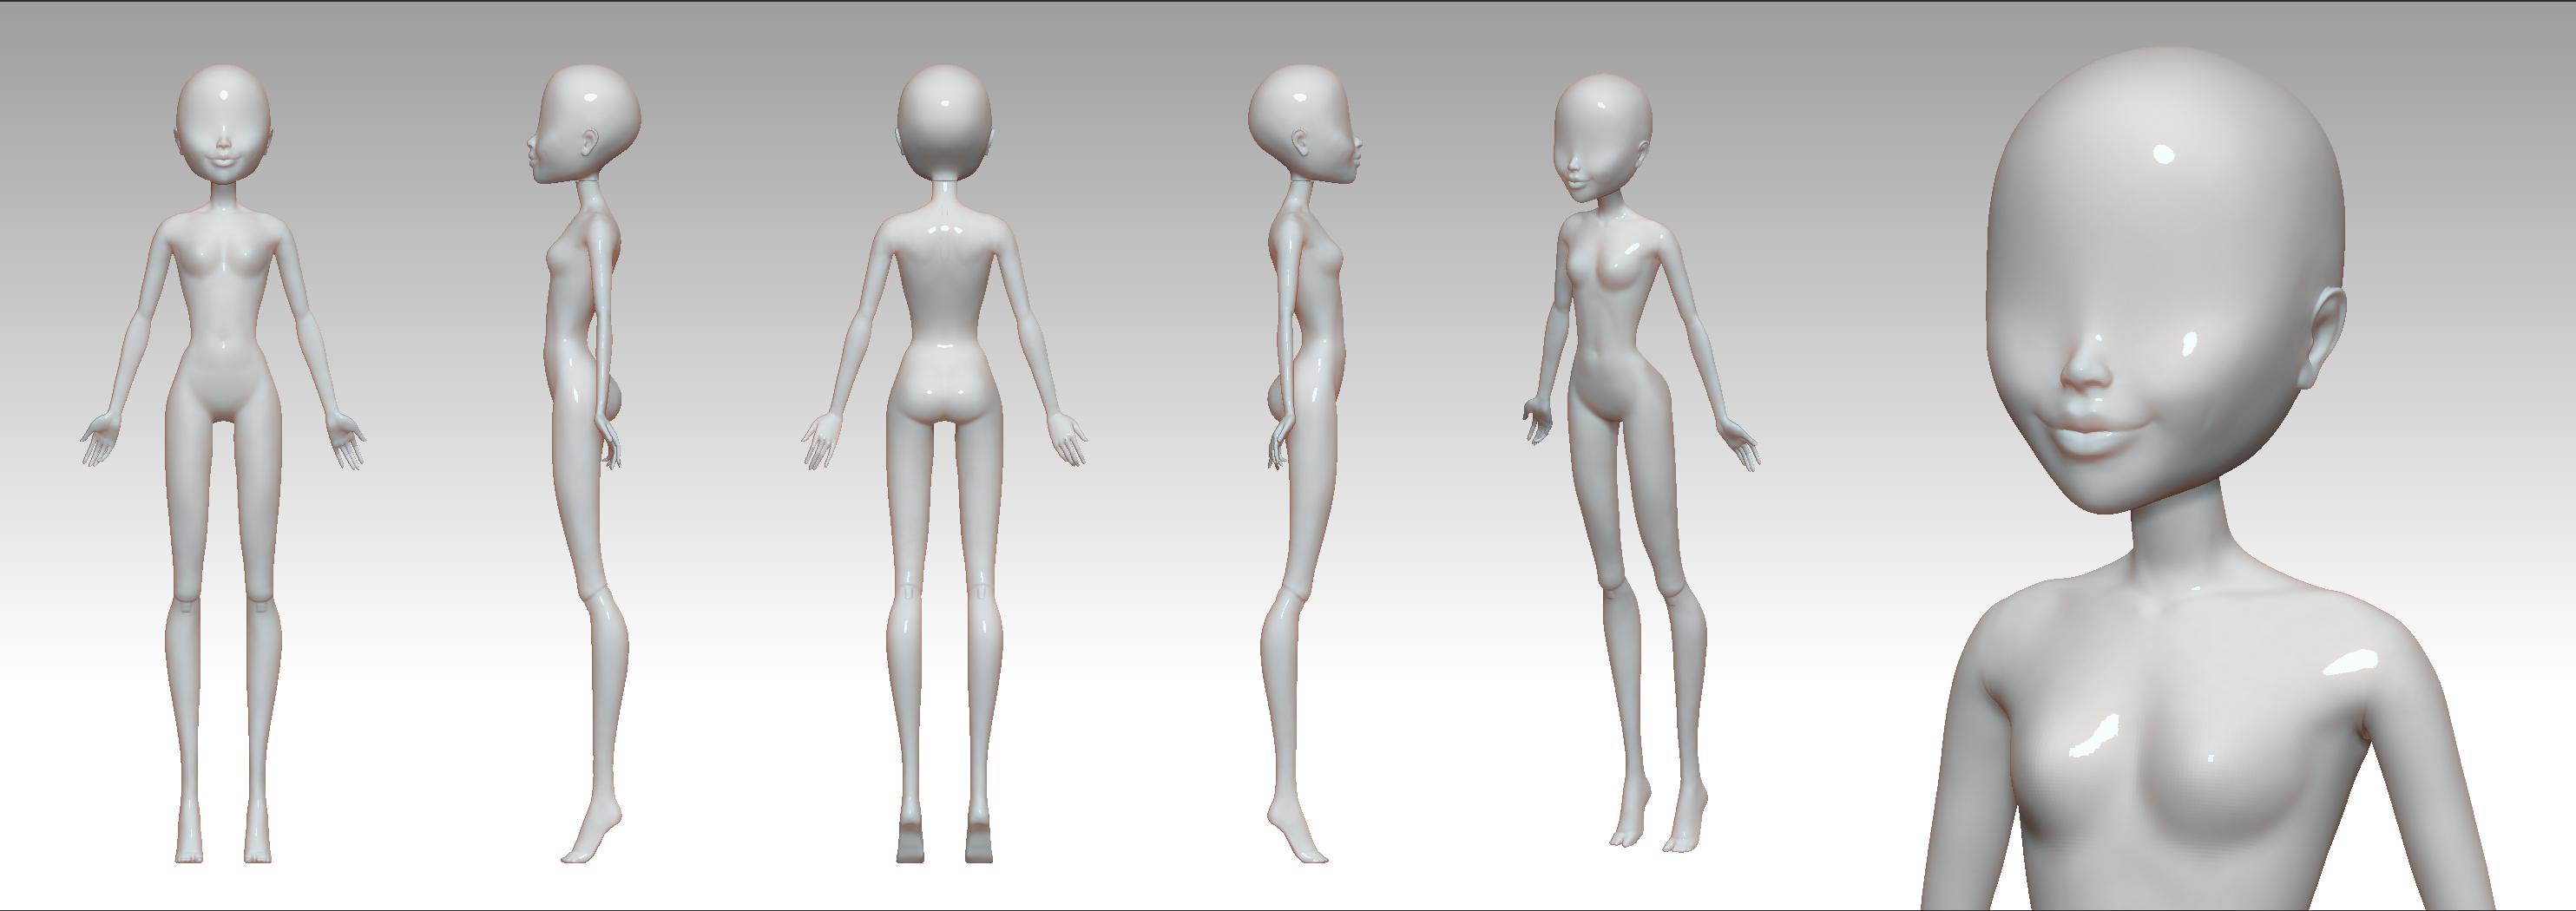 CharacterStrip2.jpg